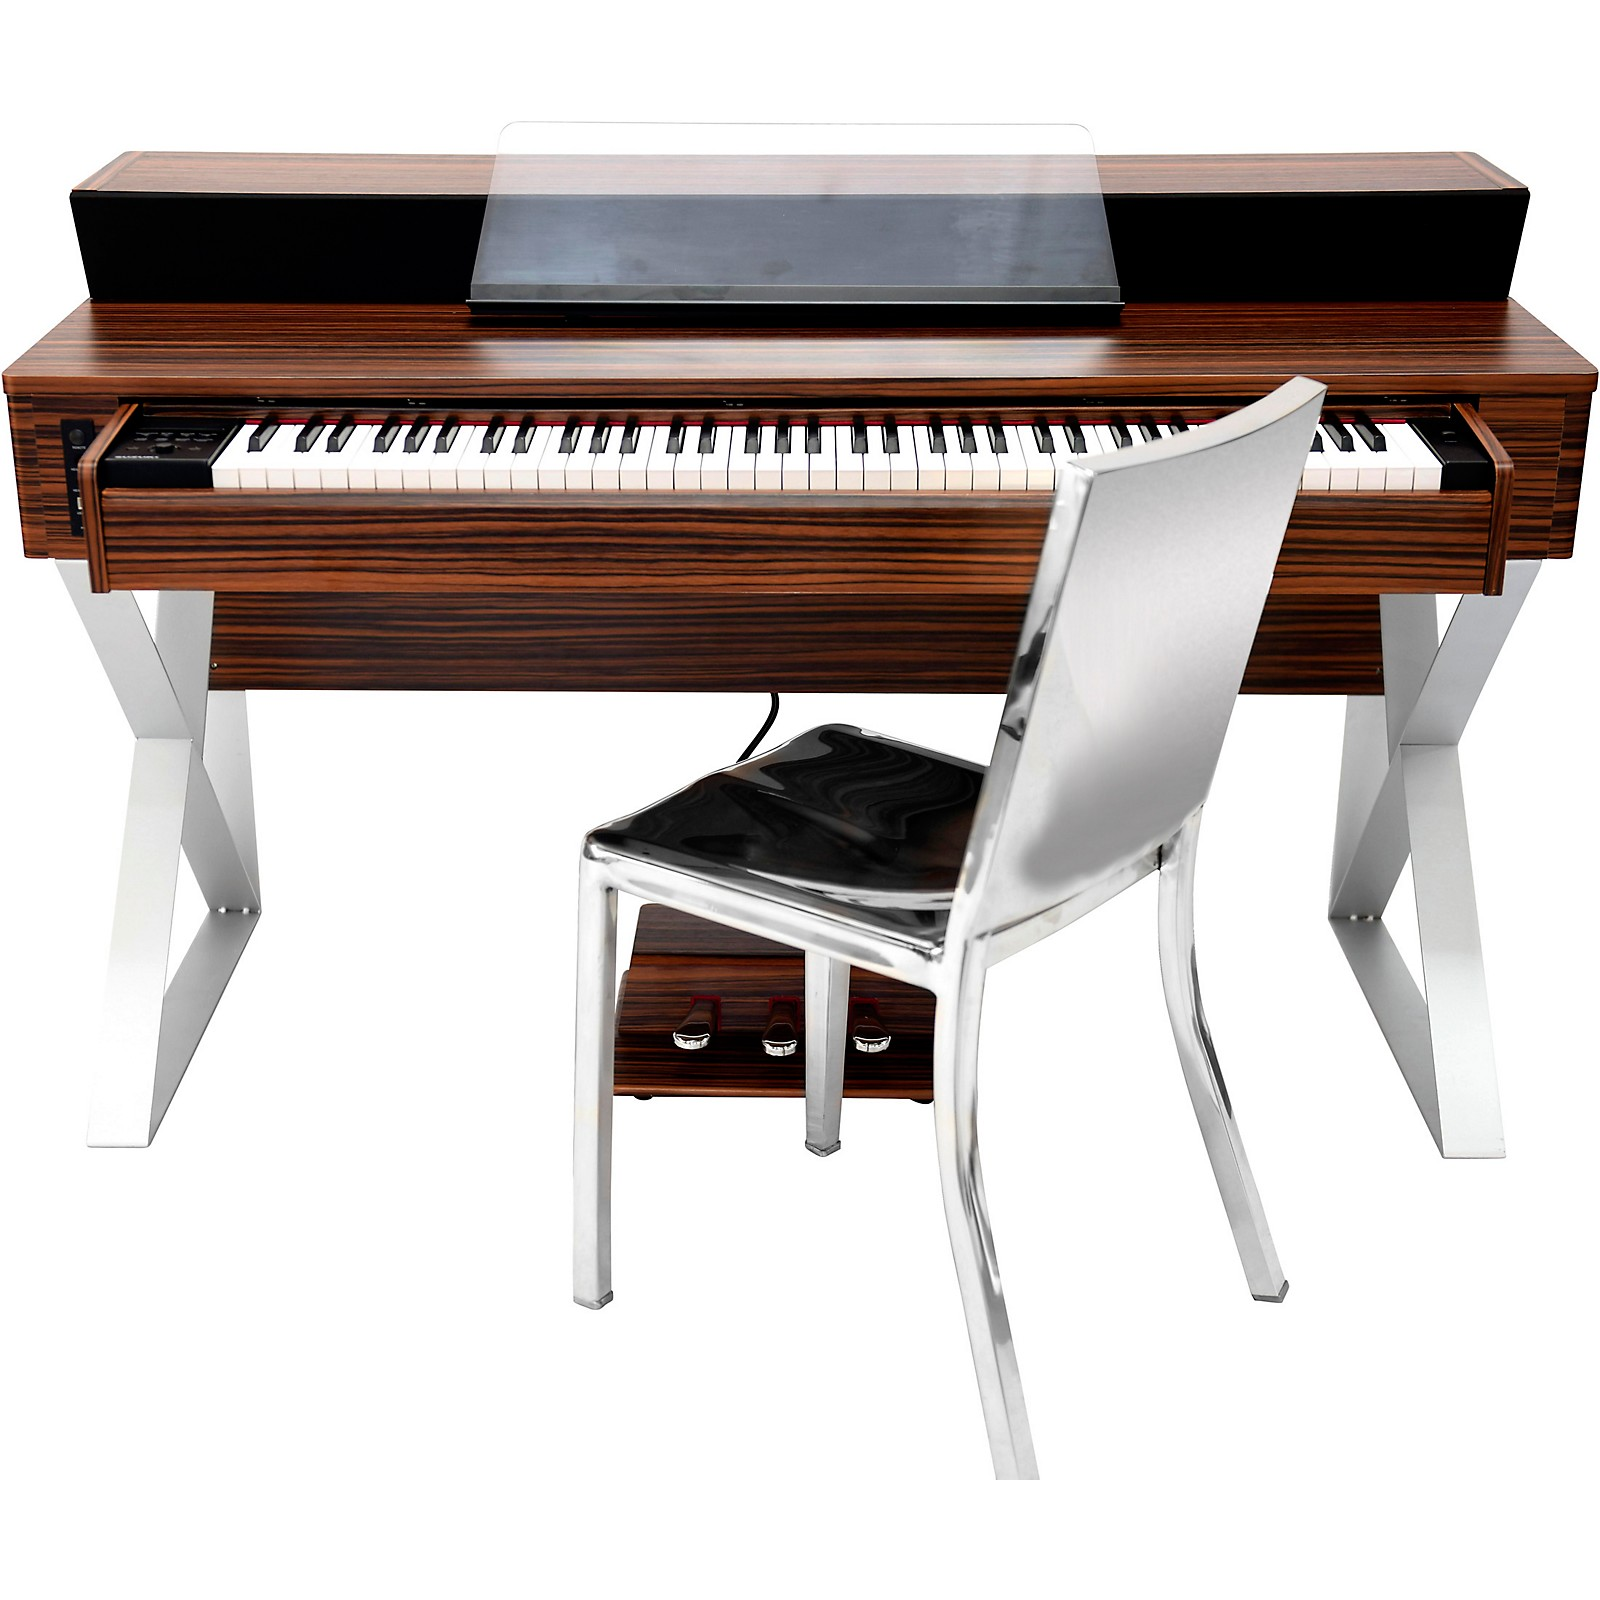 Suzuki Center Desk Digital Piano And Sound System Musician S Friend